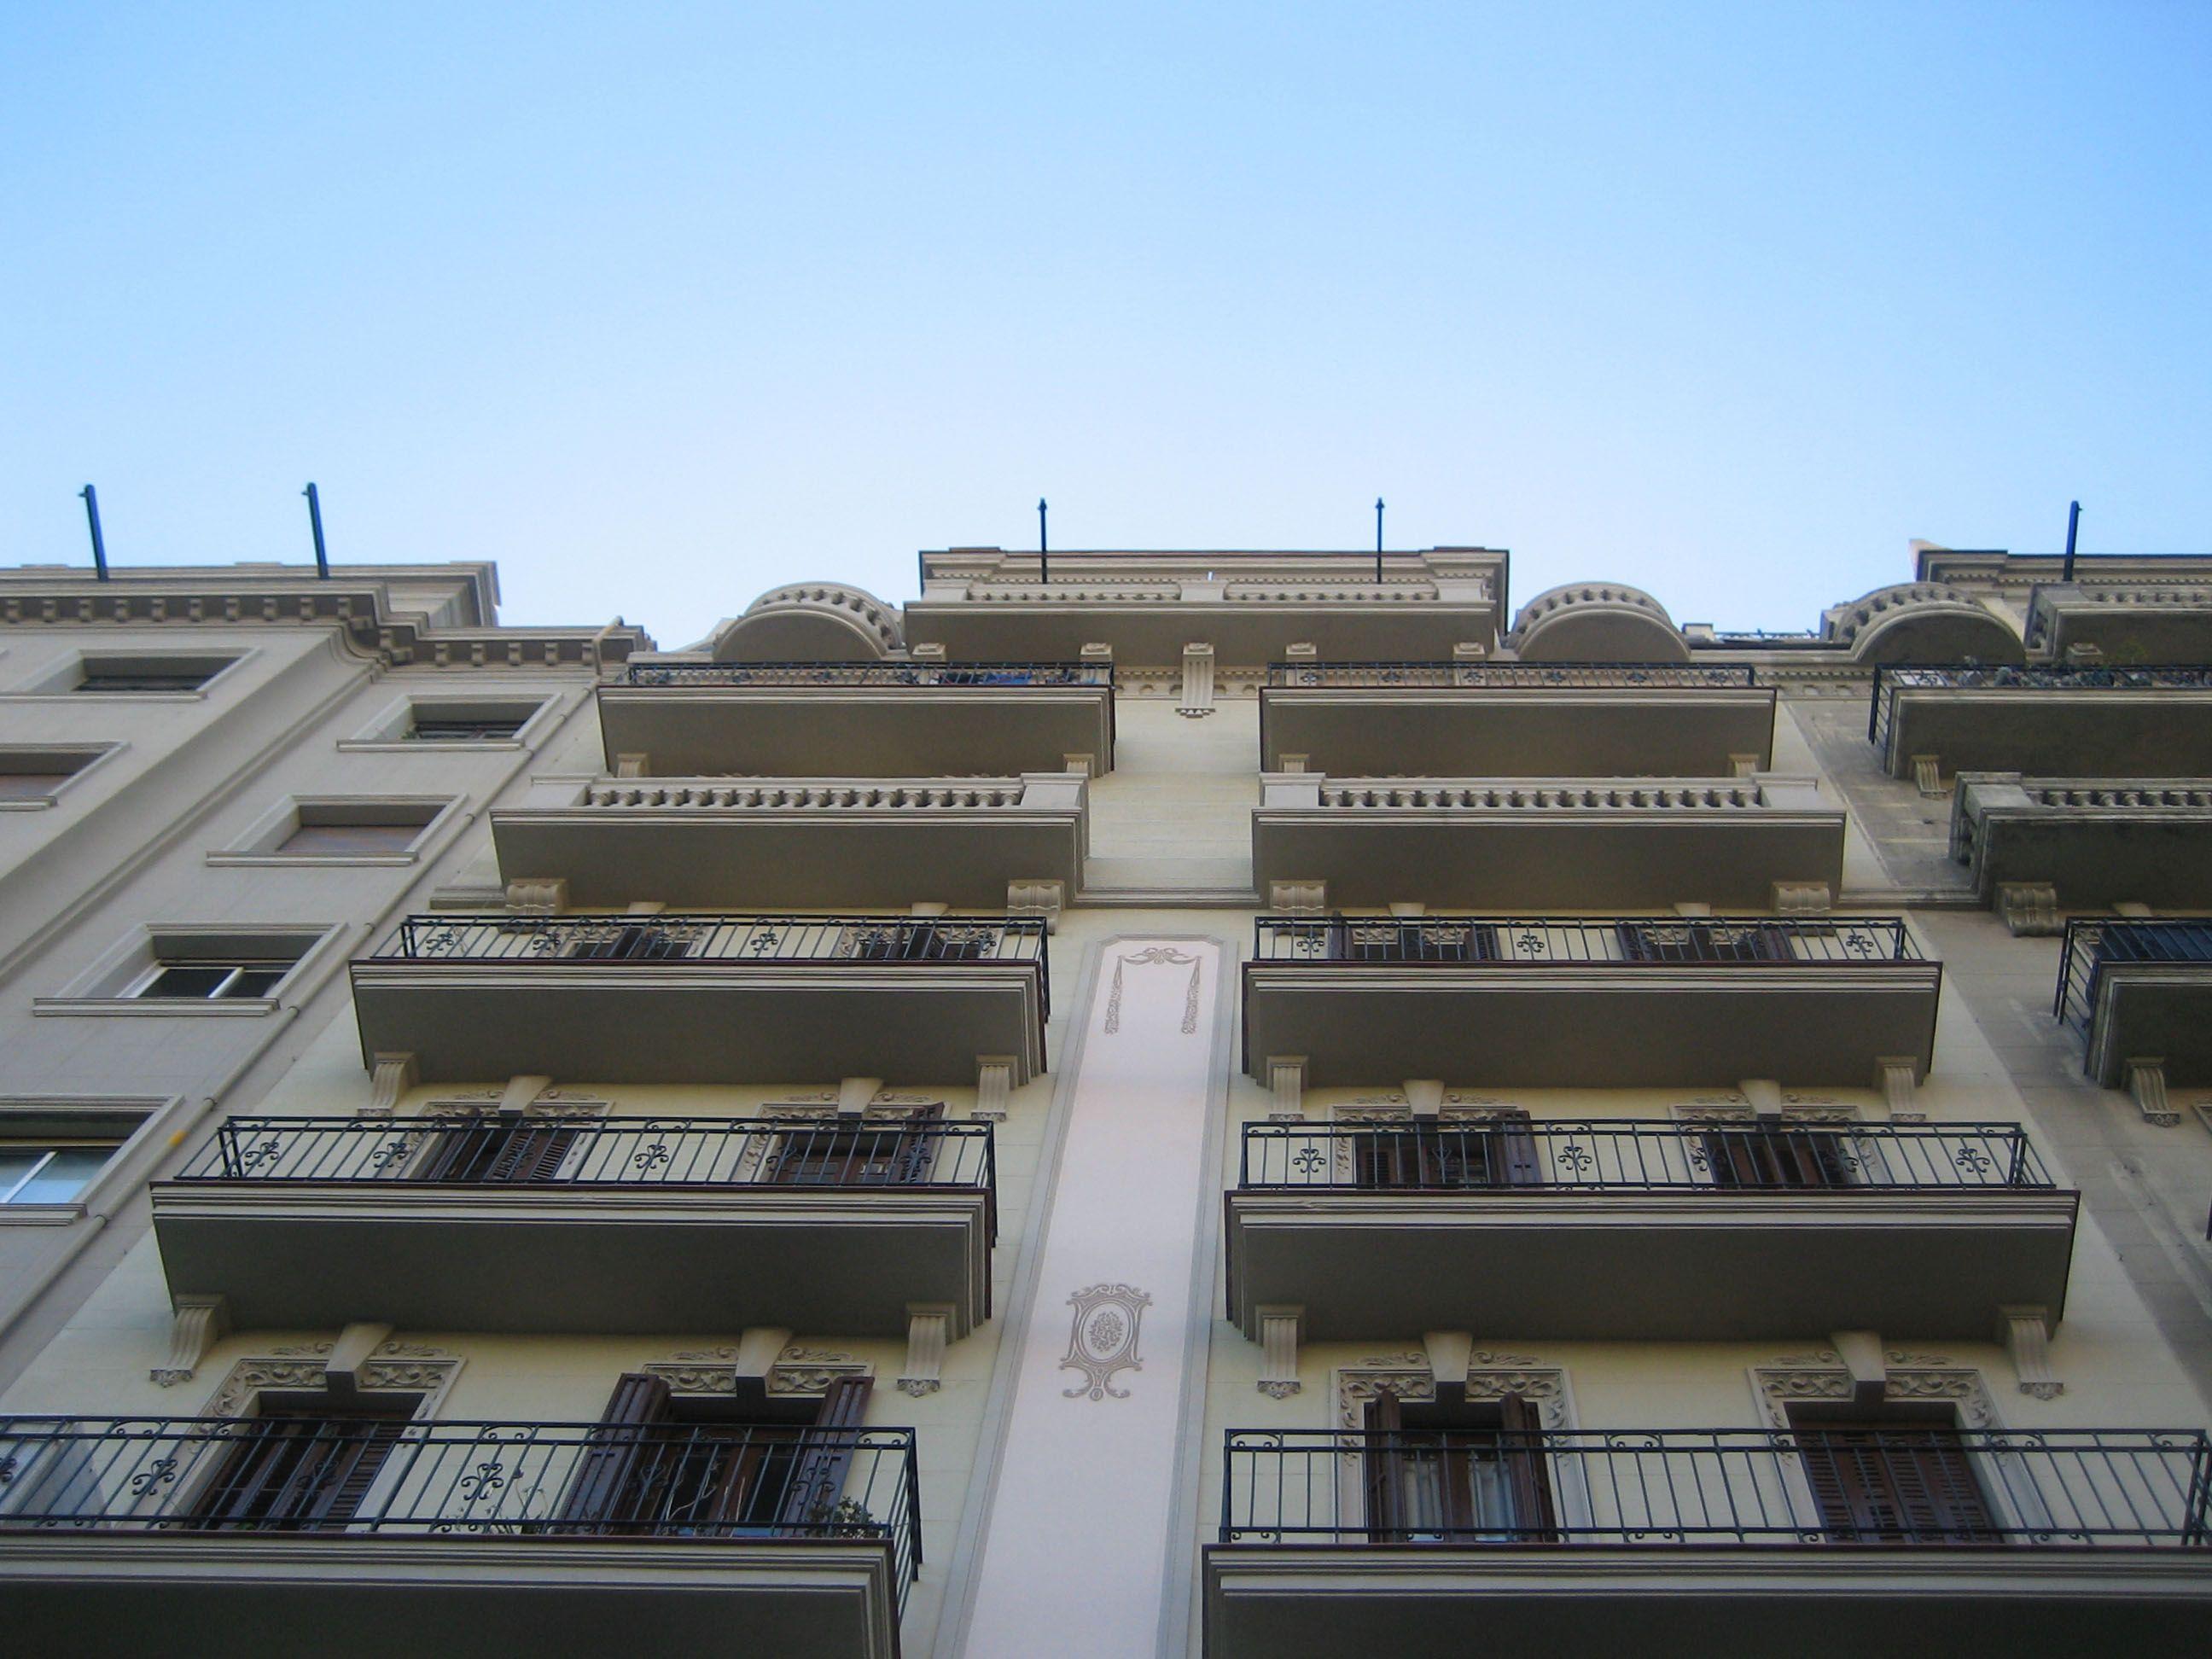 Estudio de arquitectura y urbanismo en Sant Gervasi